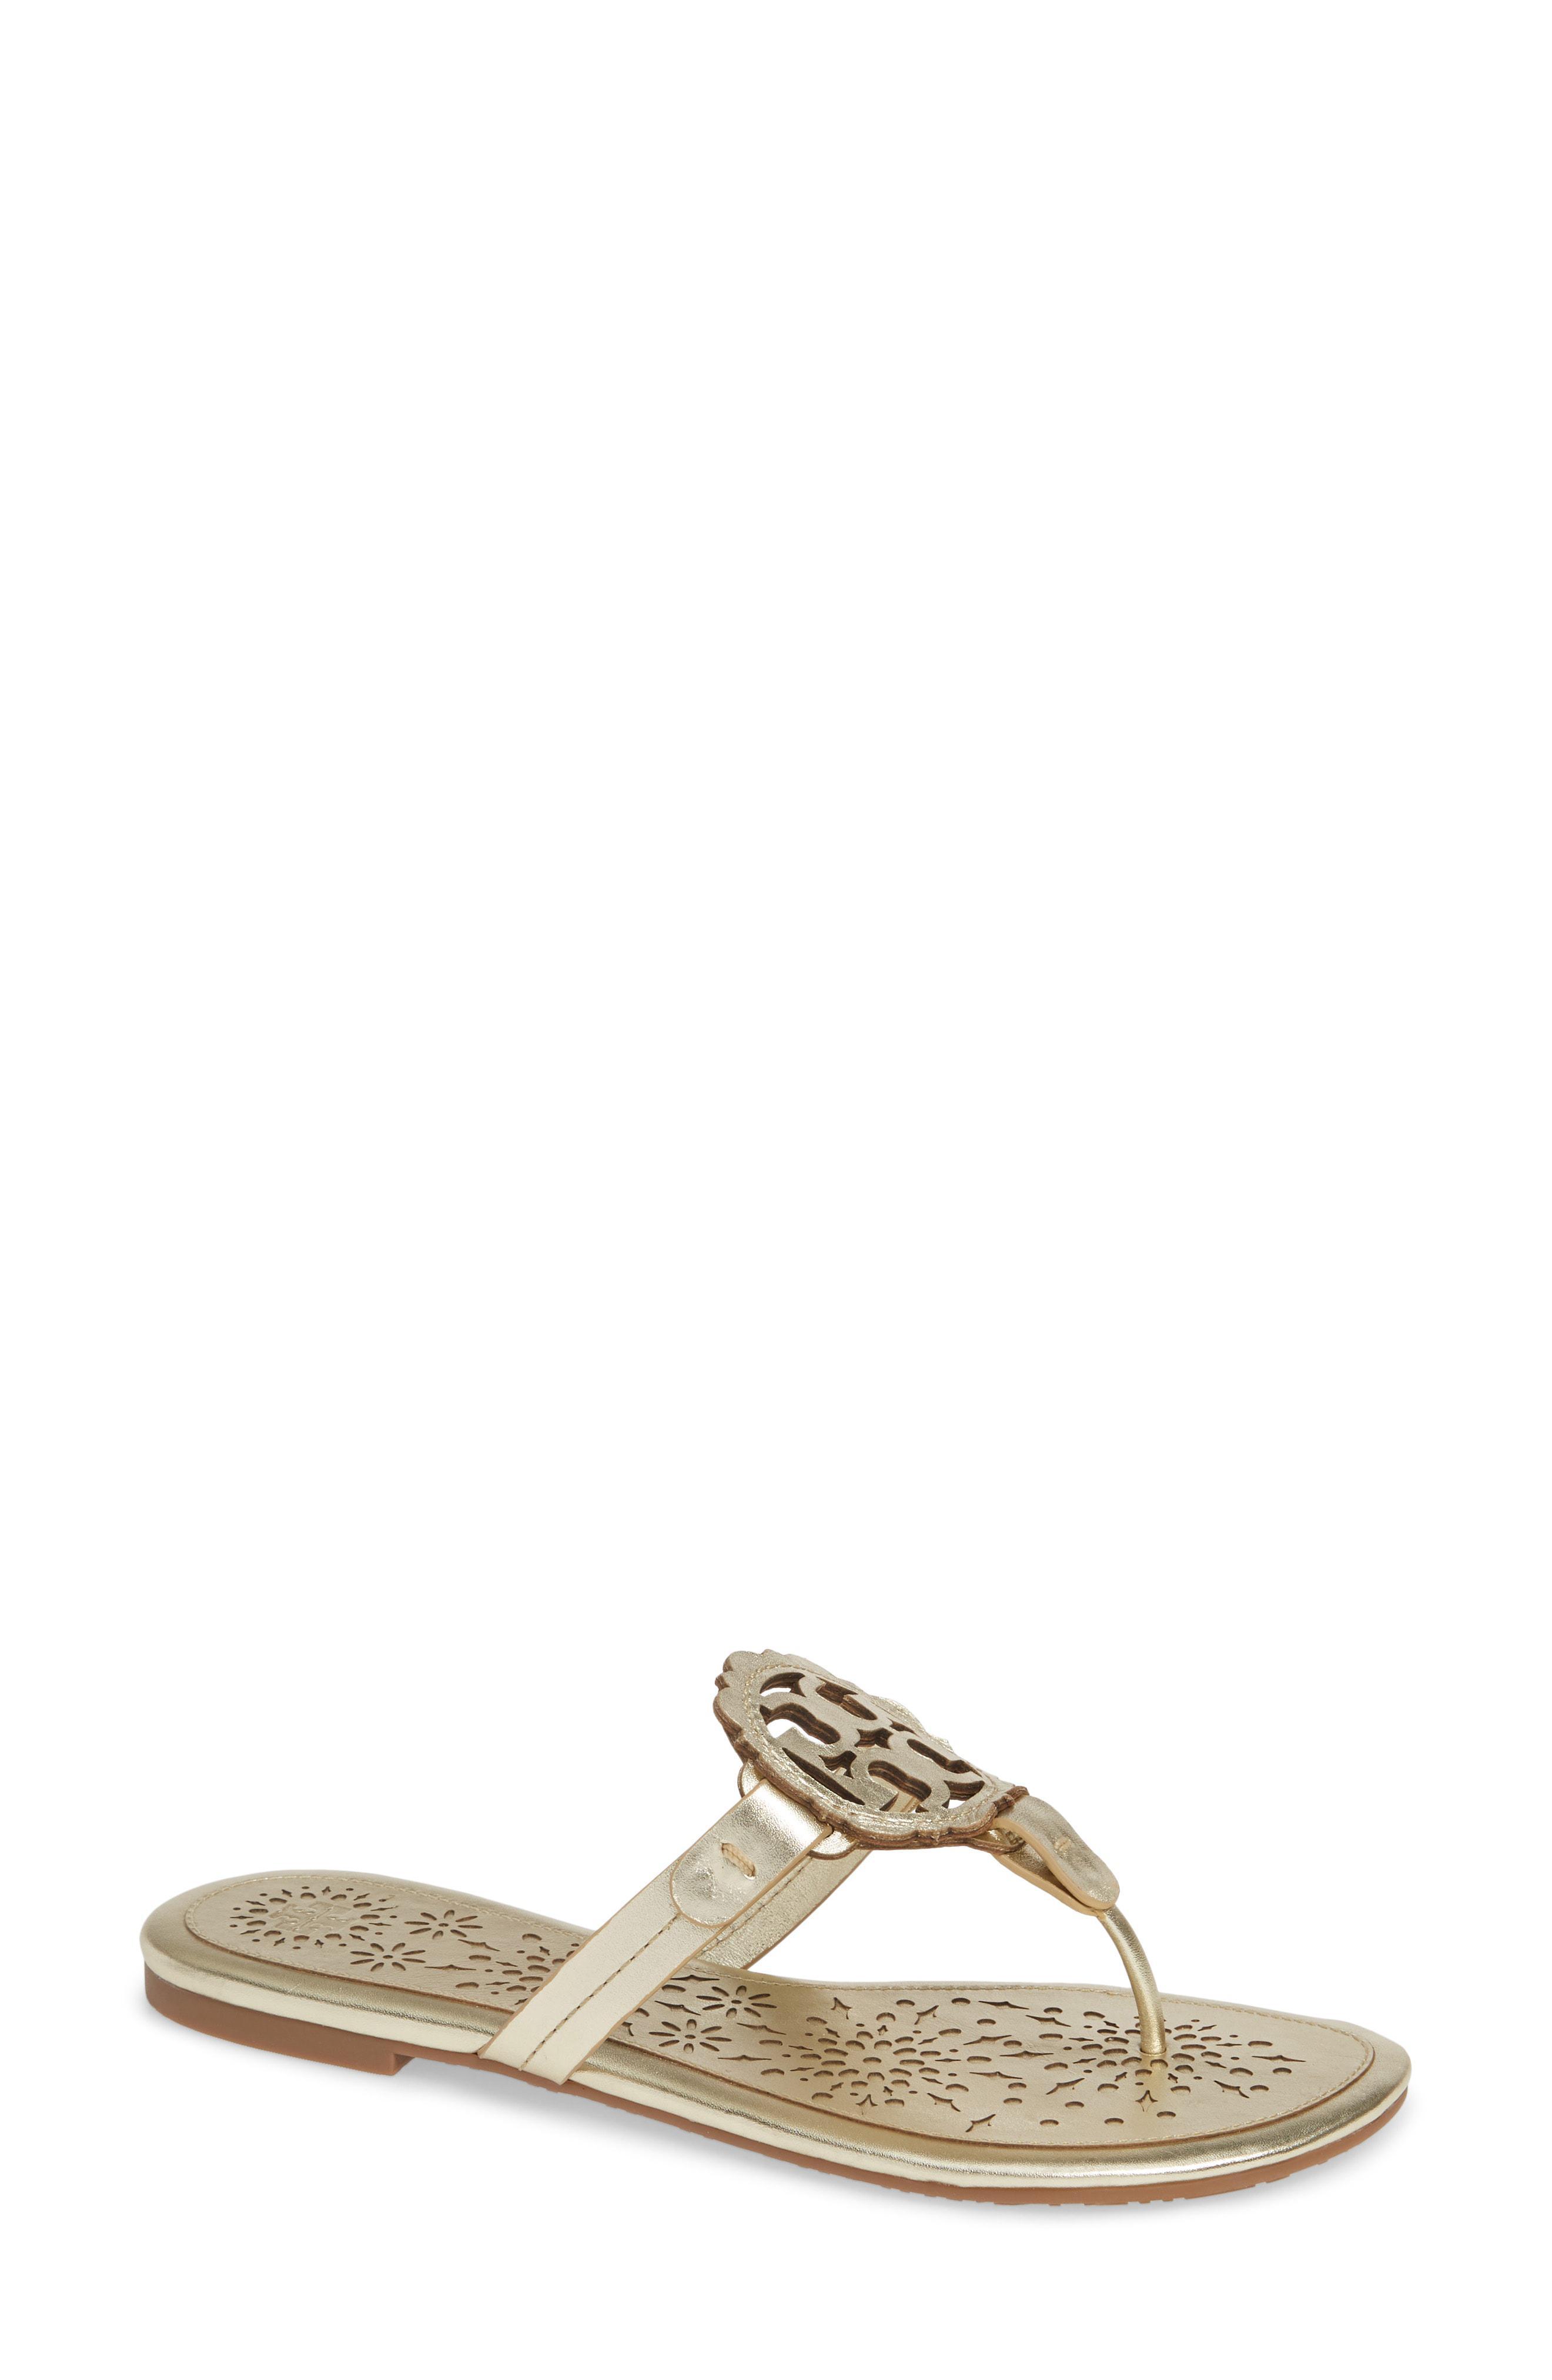 c61aa015c06 Lyst - Tory Burch Miller Scalloped Medallion Sandal in Metallic